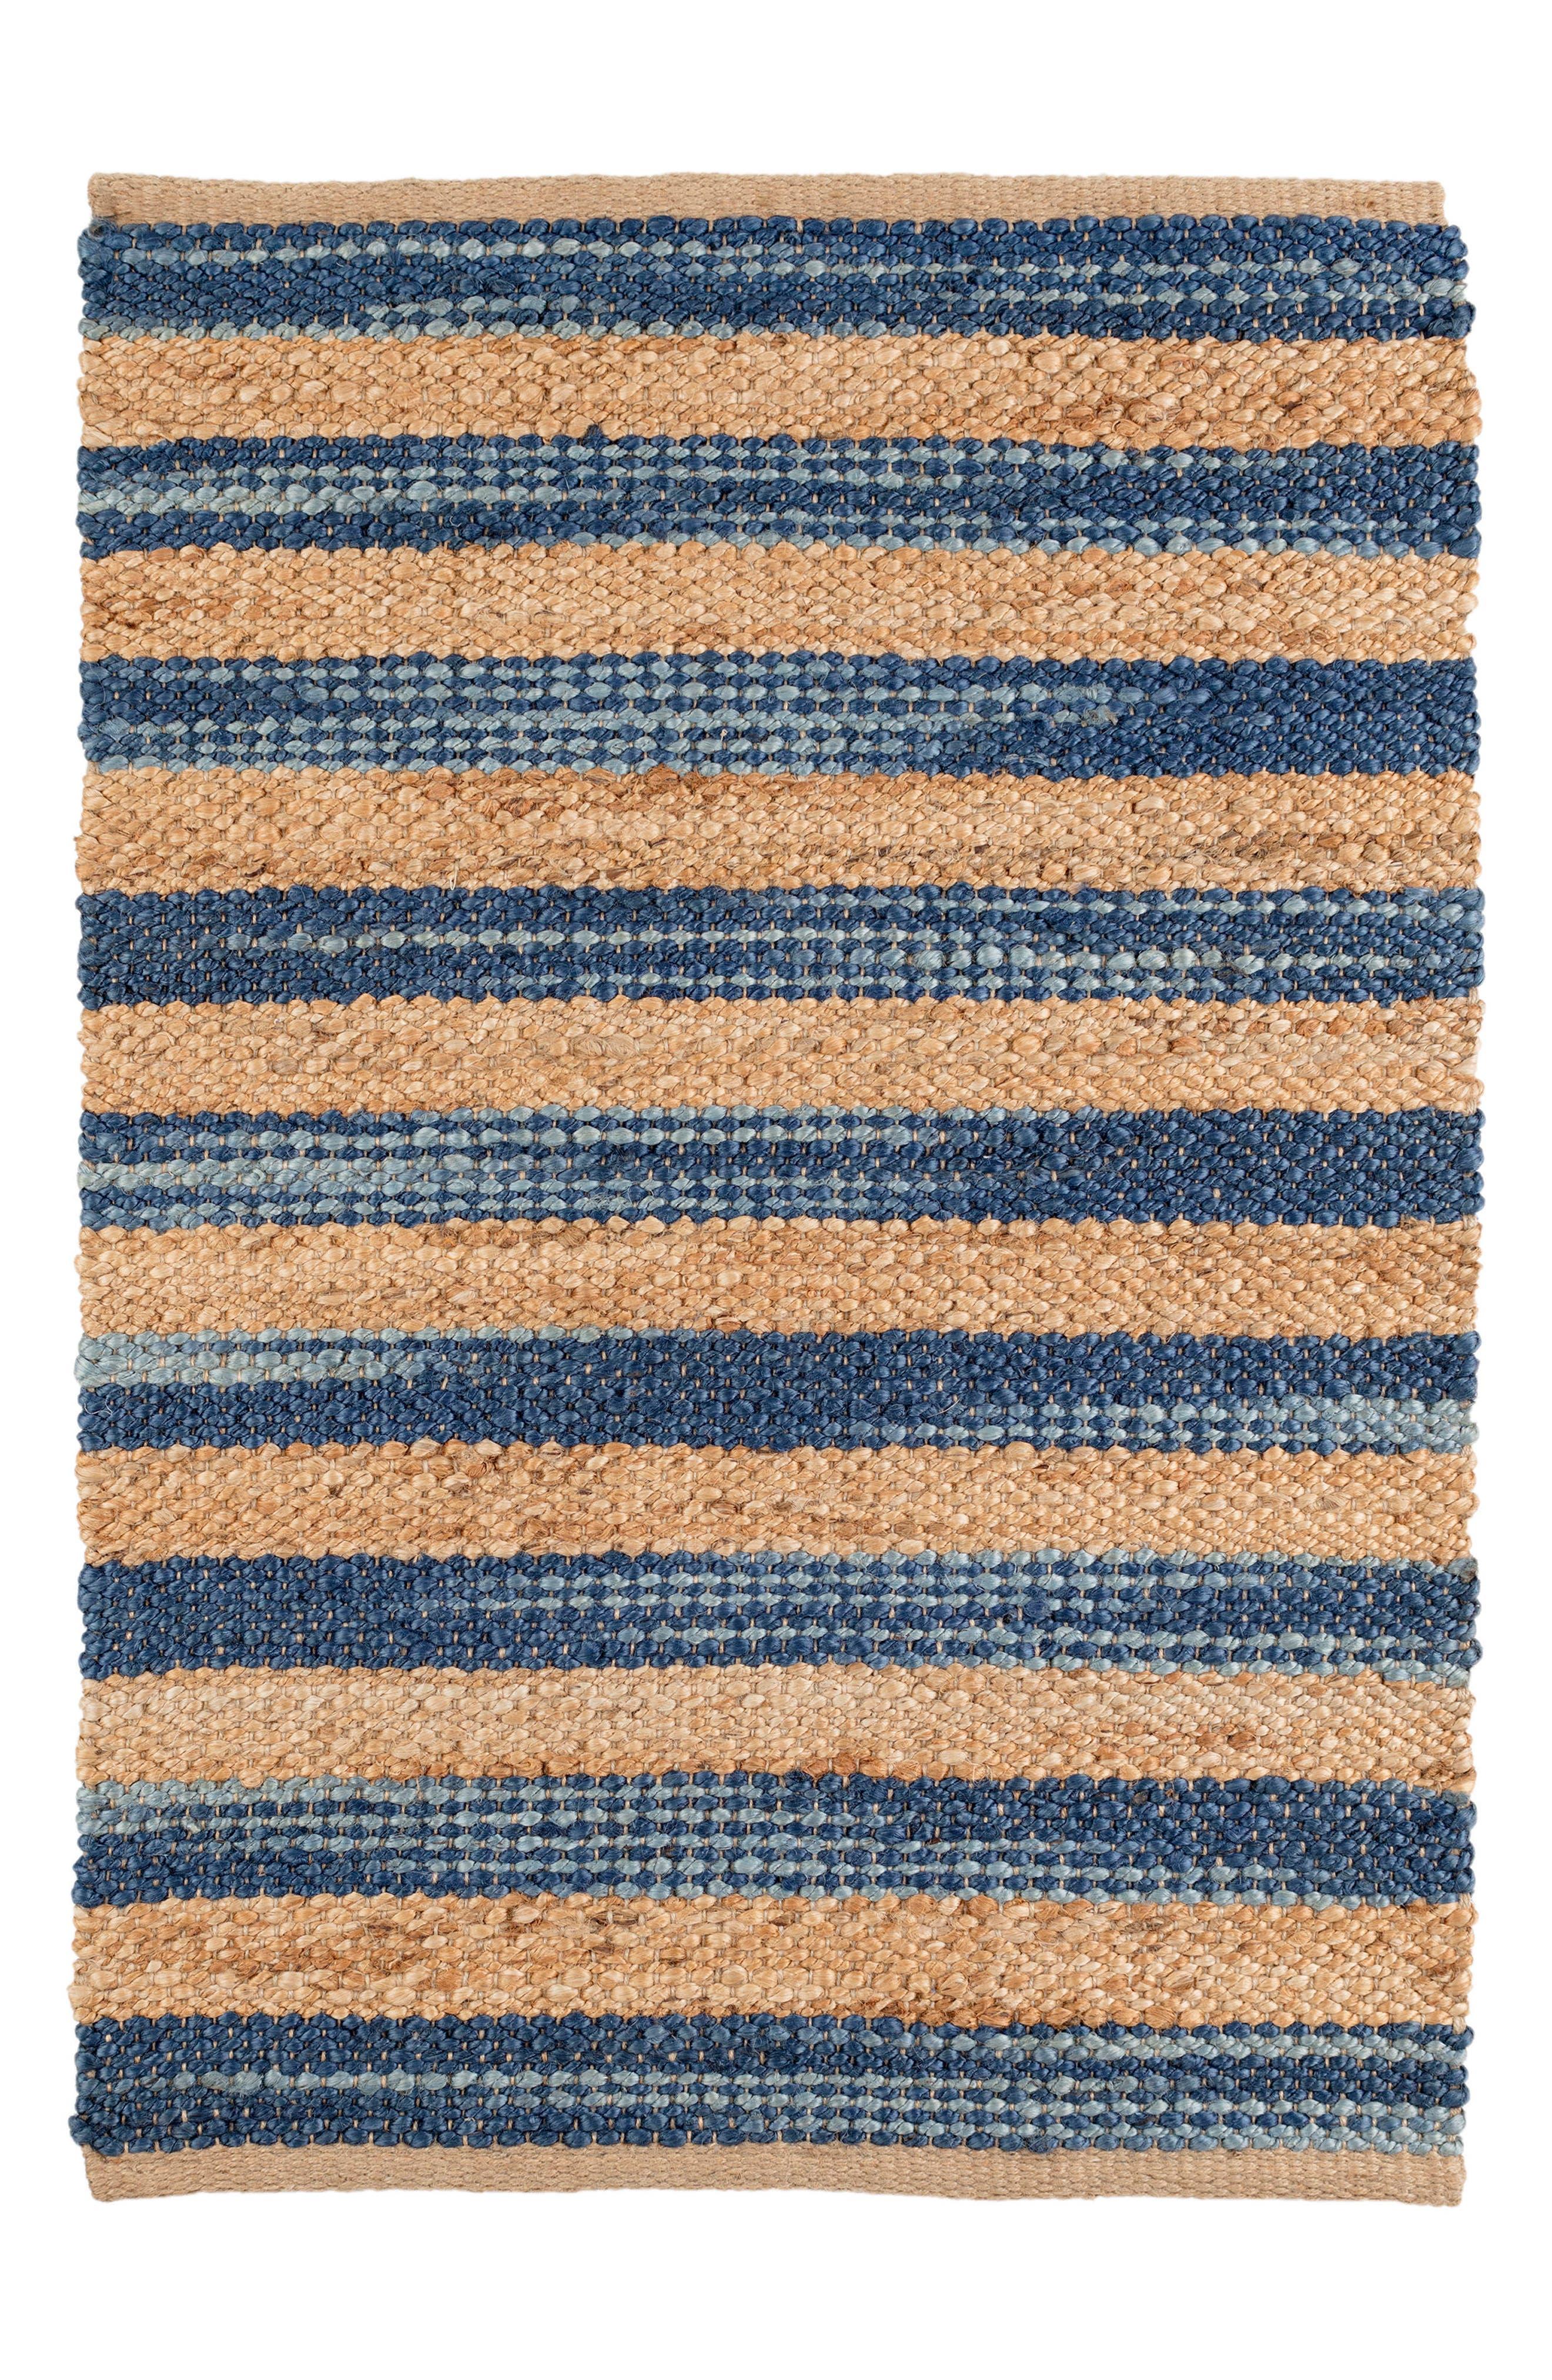 Corfu Woven Wool Rug,                             Main thumbnail 1, color,                             Blue